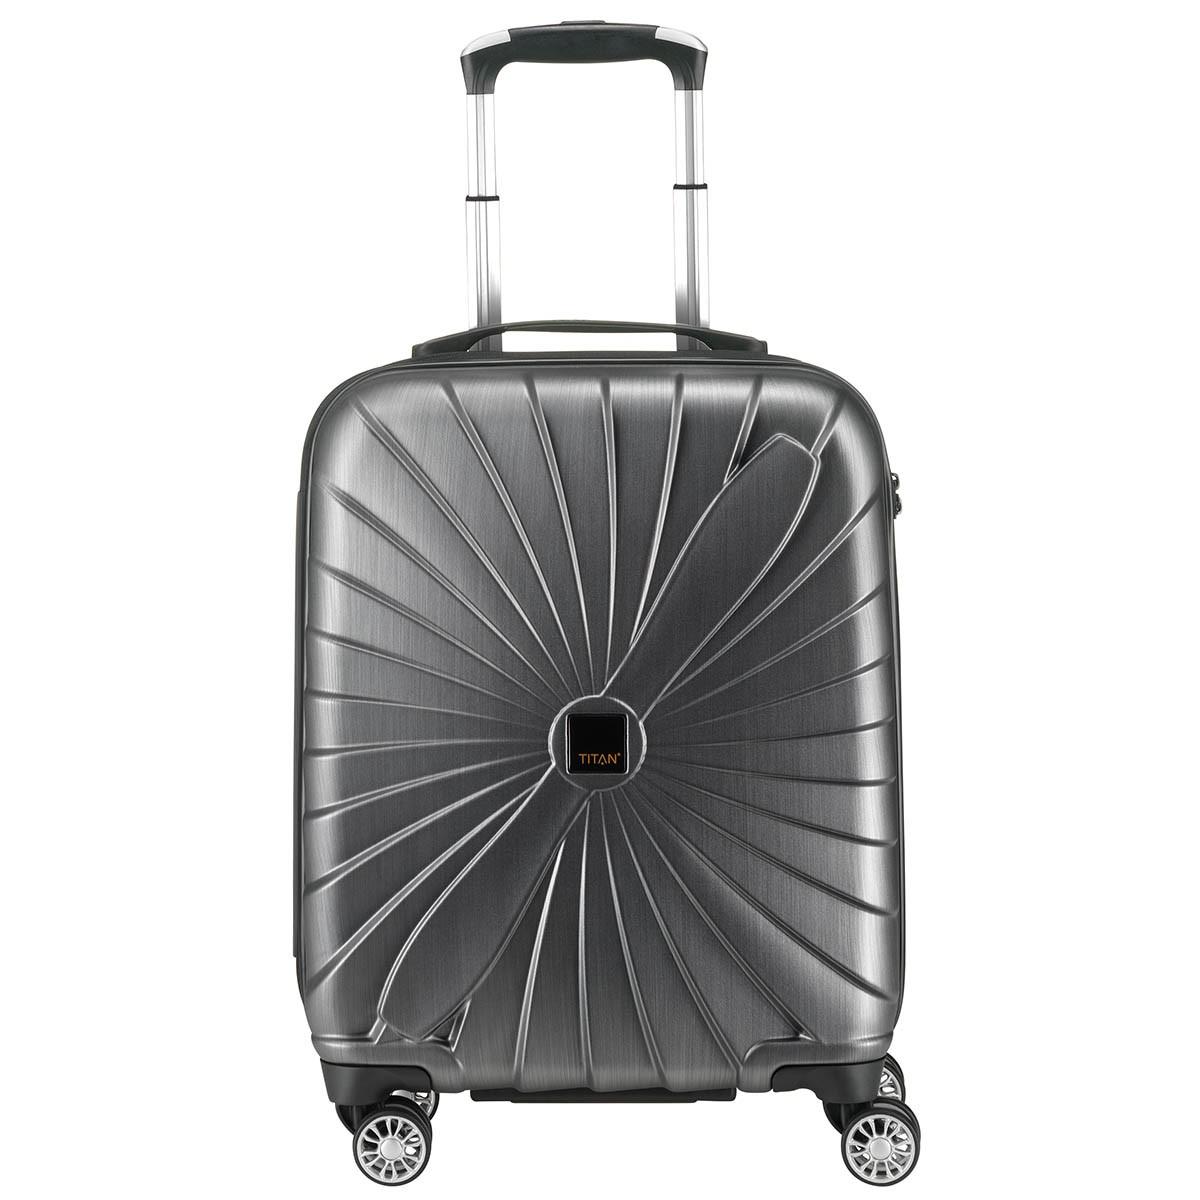 titan triport 4 rollen kabinen bord trolley hartschale. Black Bedroom Furniture Sets. Home Design Ideas